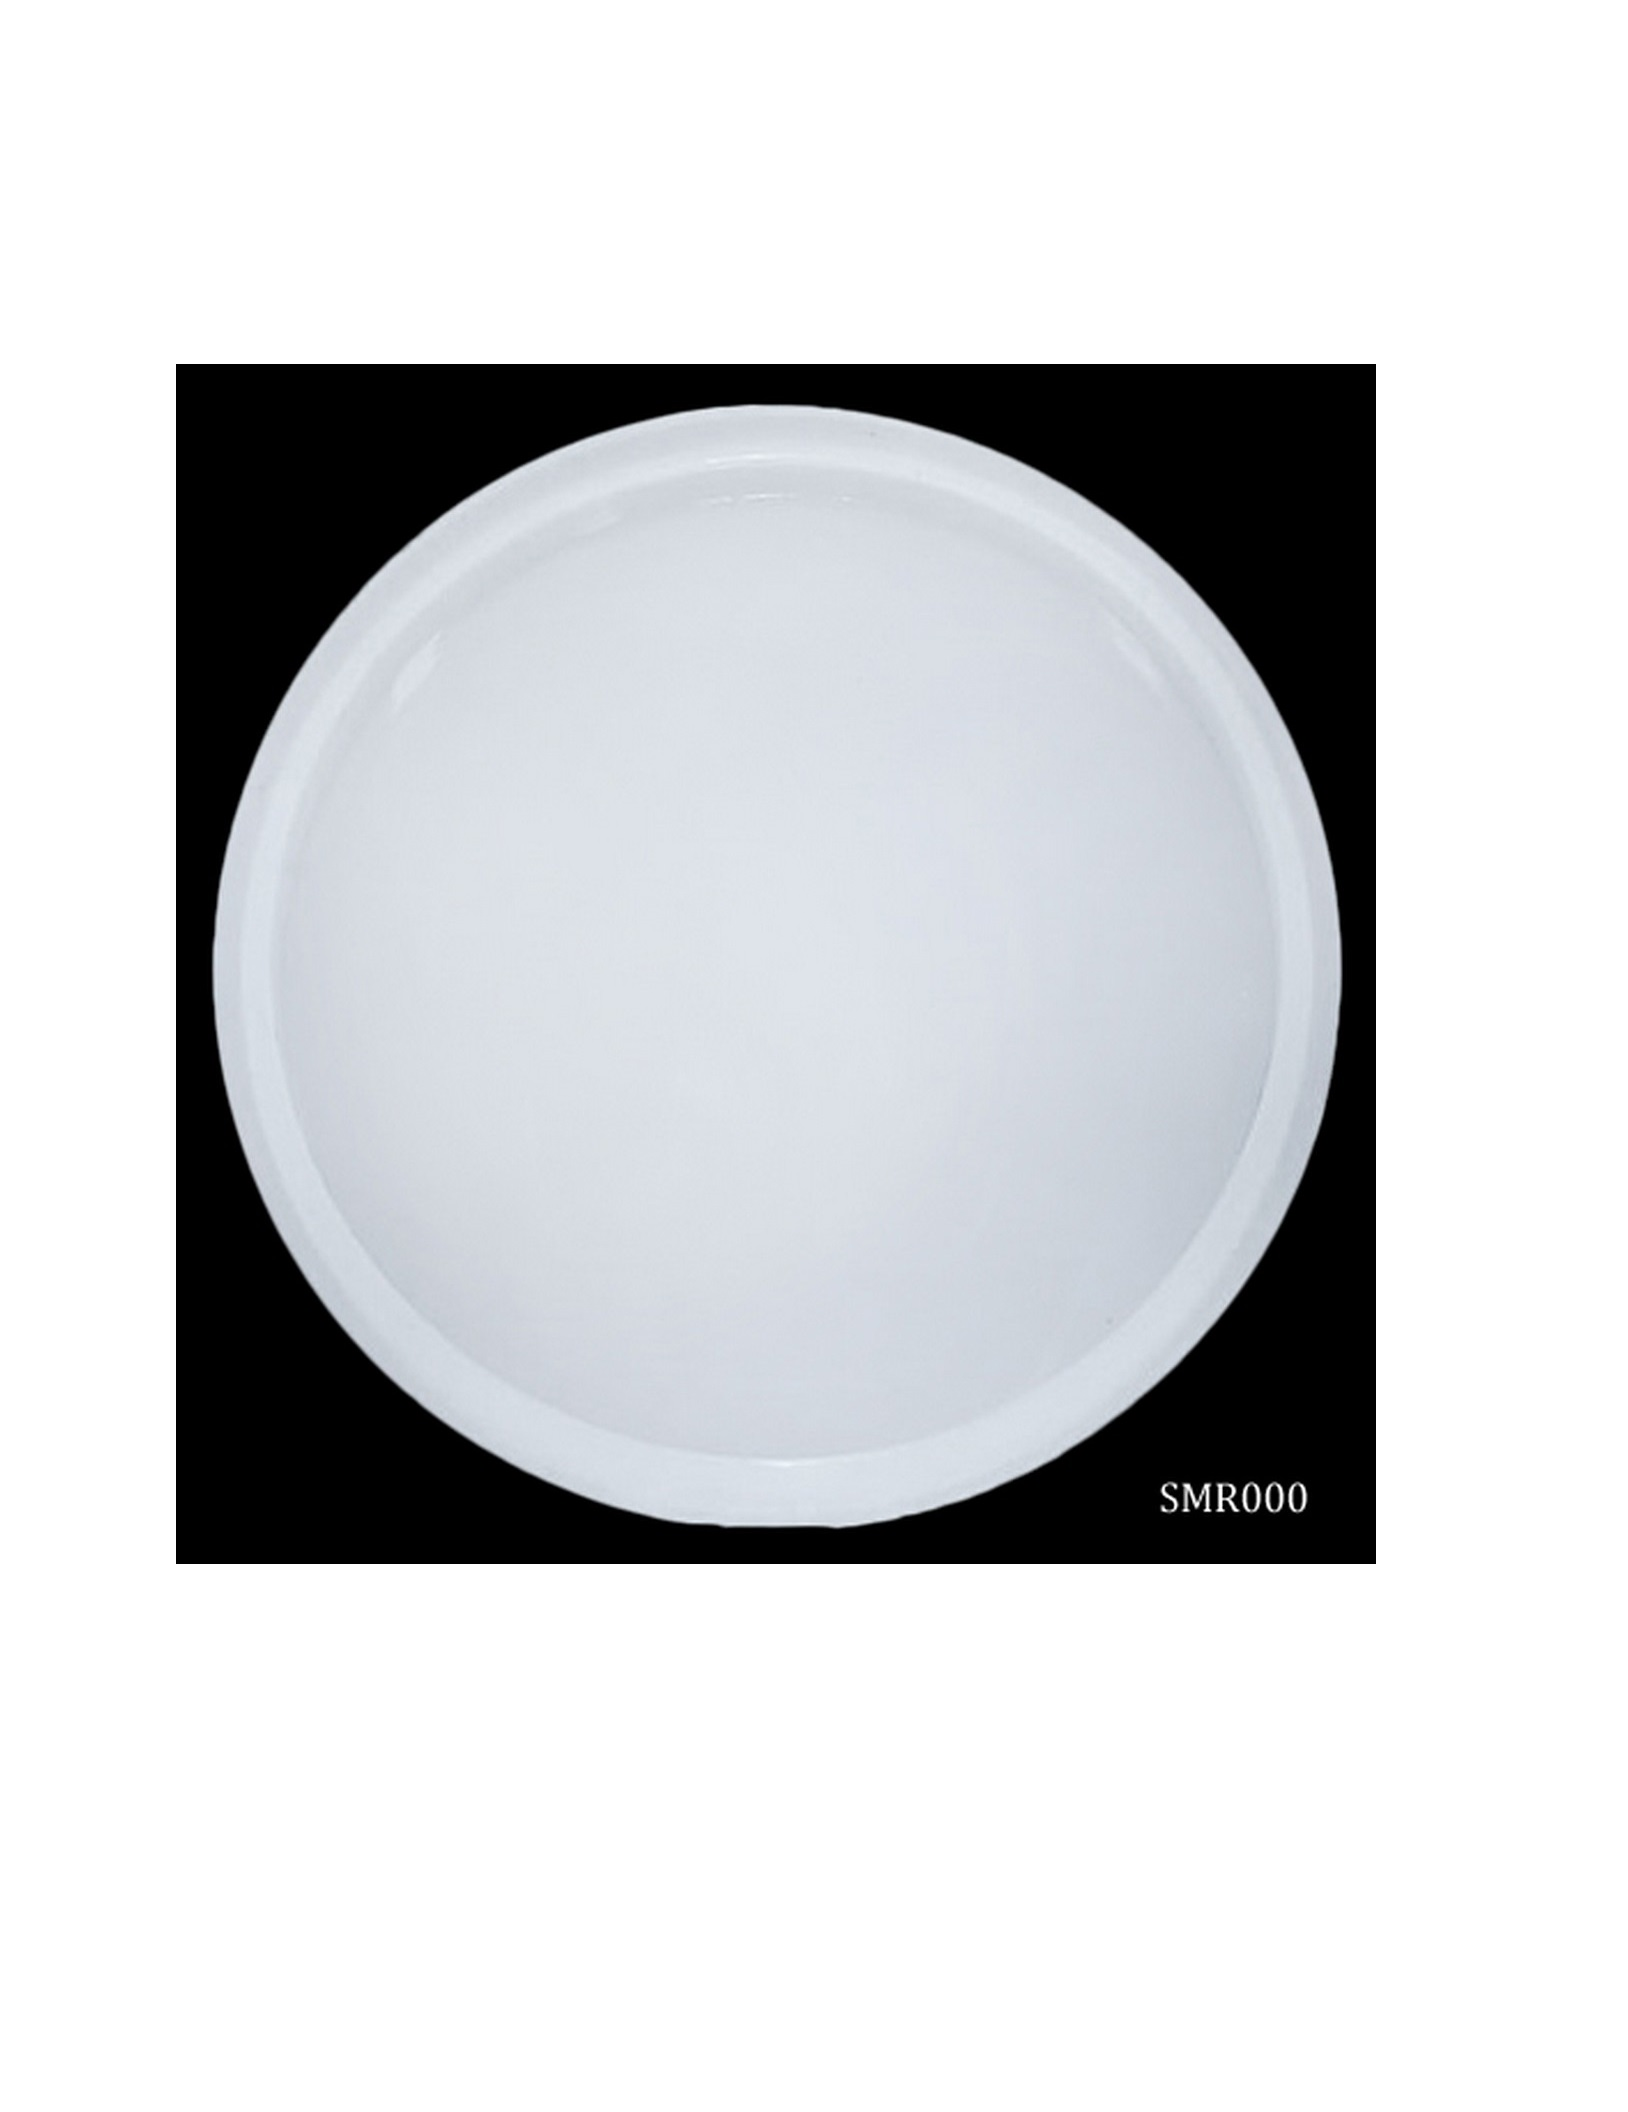 Silicone Mould Round 3.5X3.5Inc SMR000